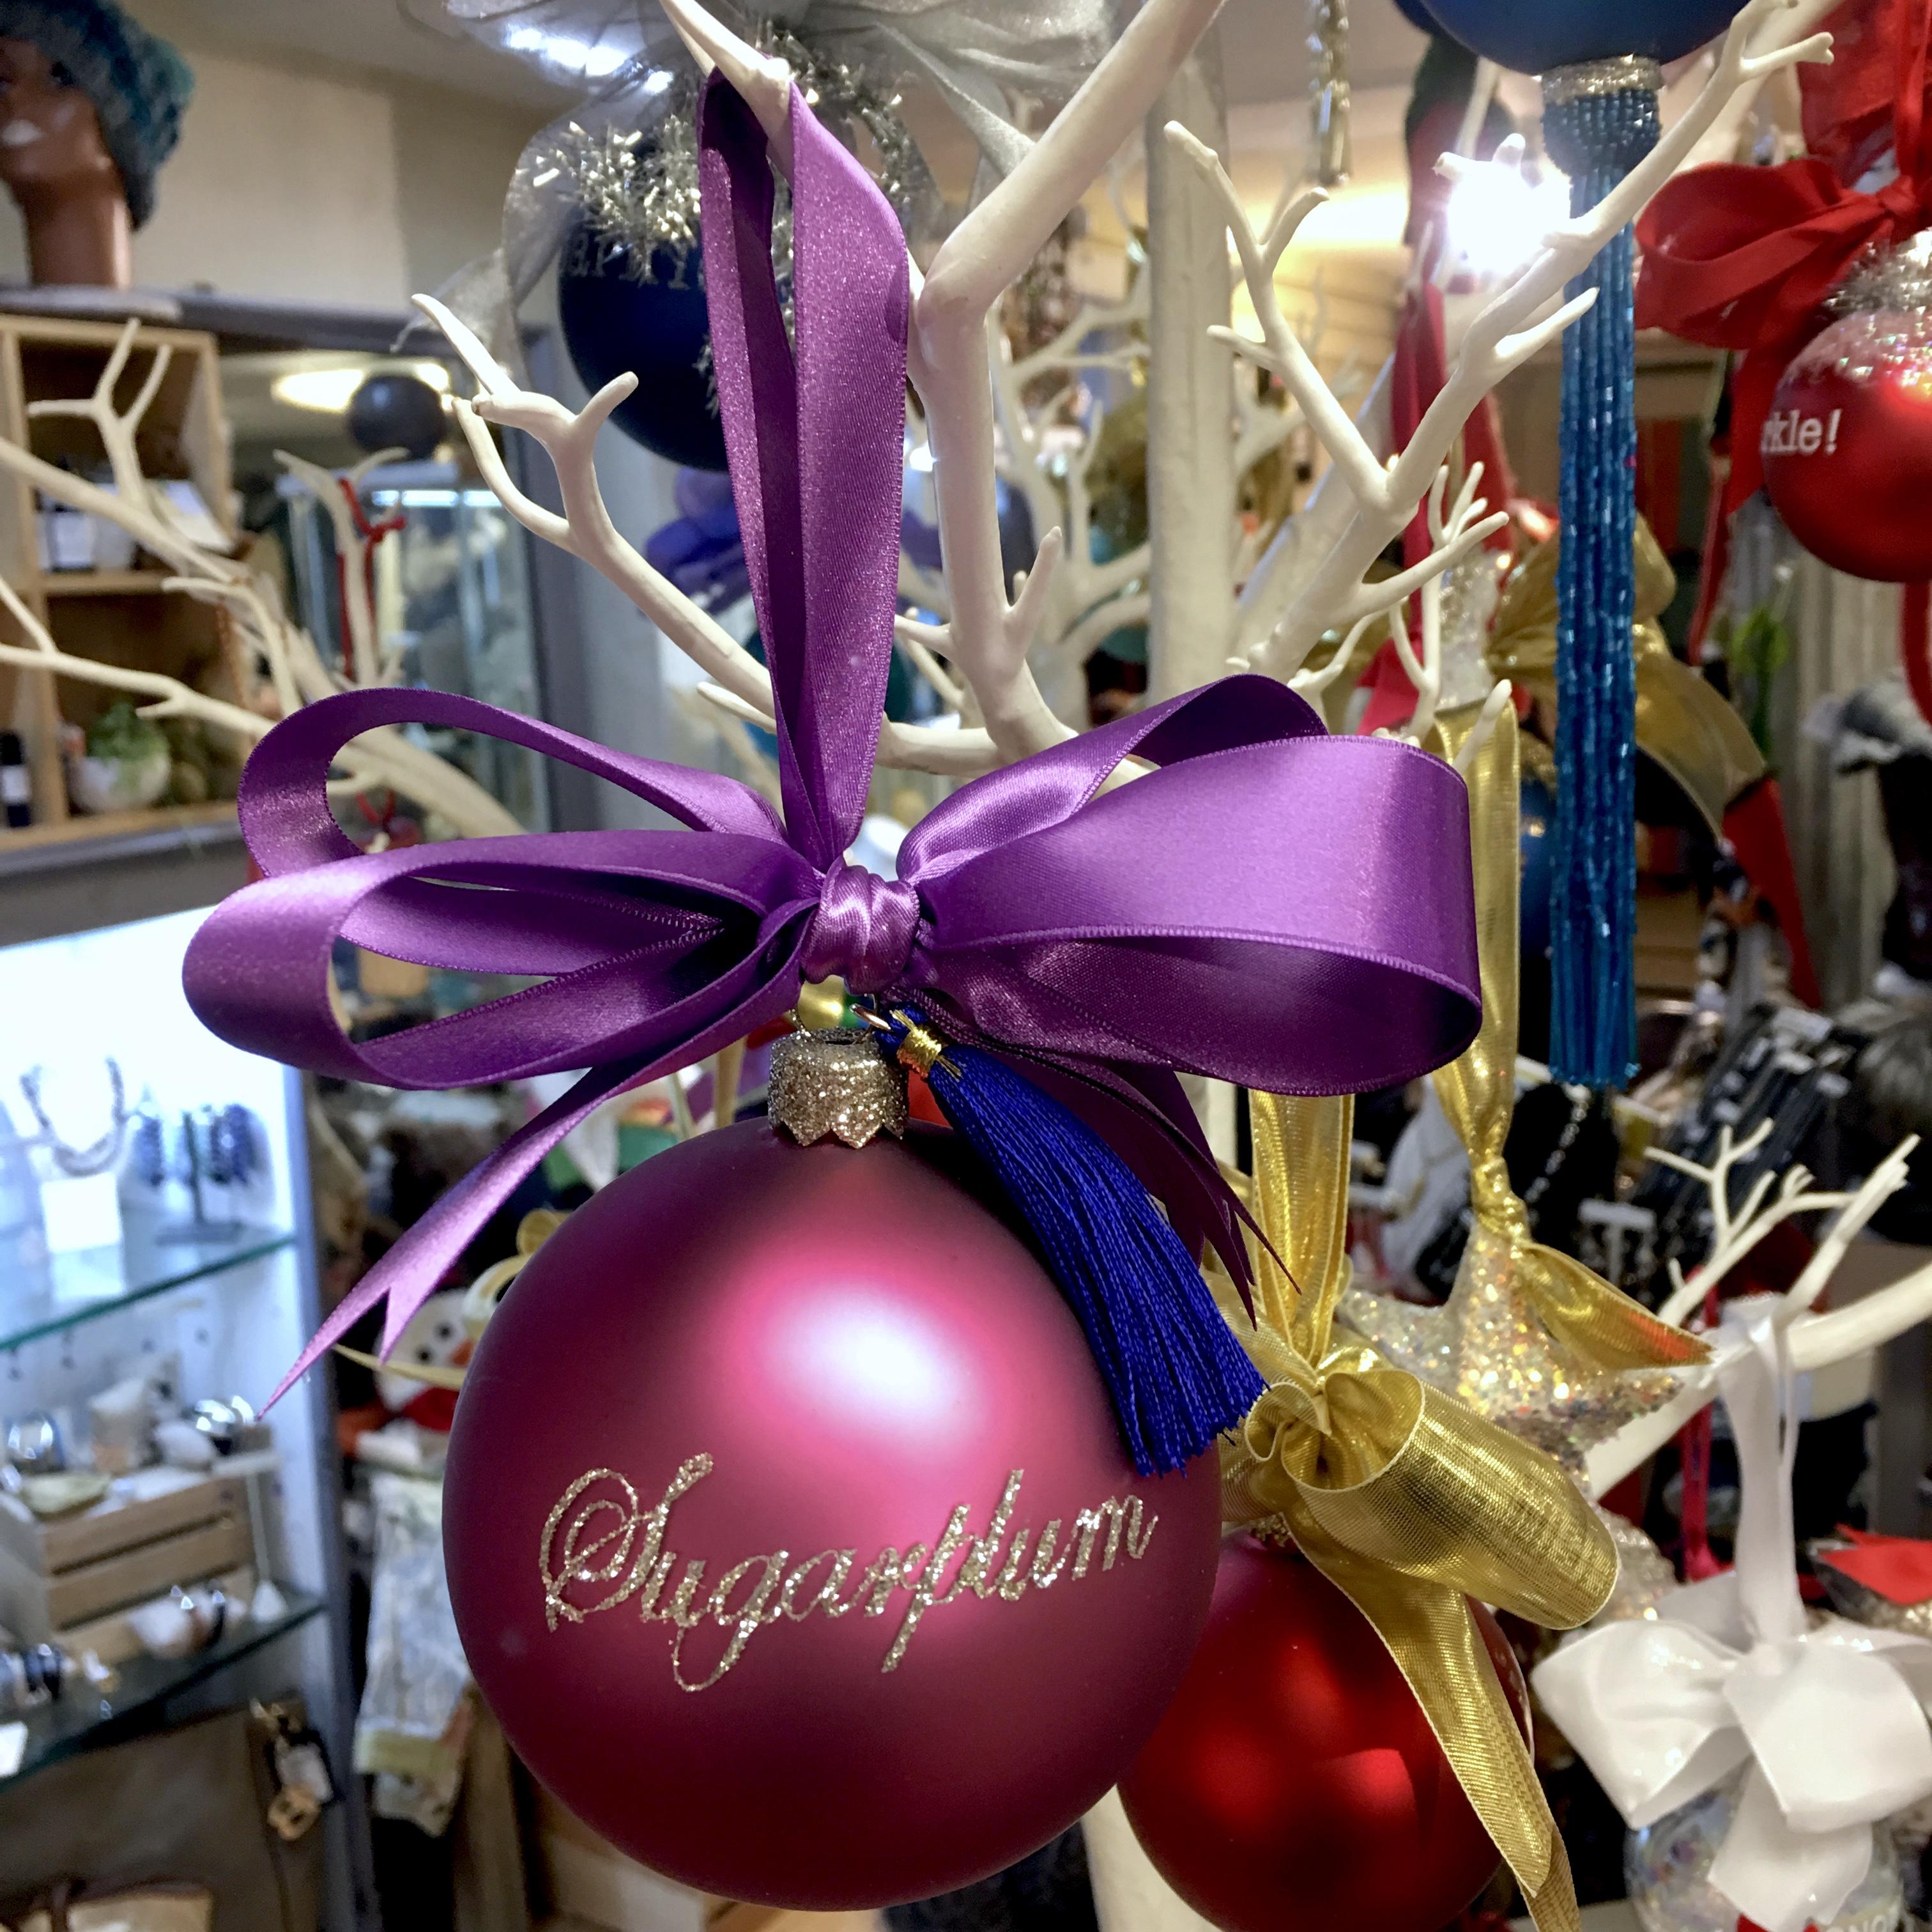 Sugarplum glass ornament